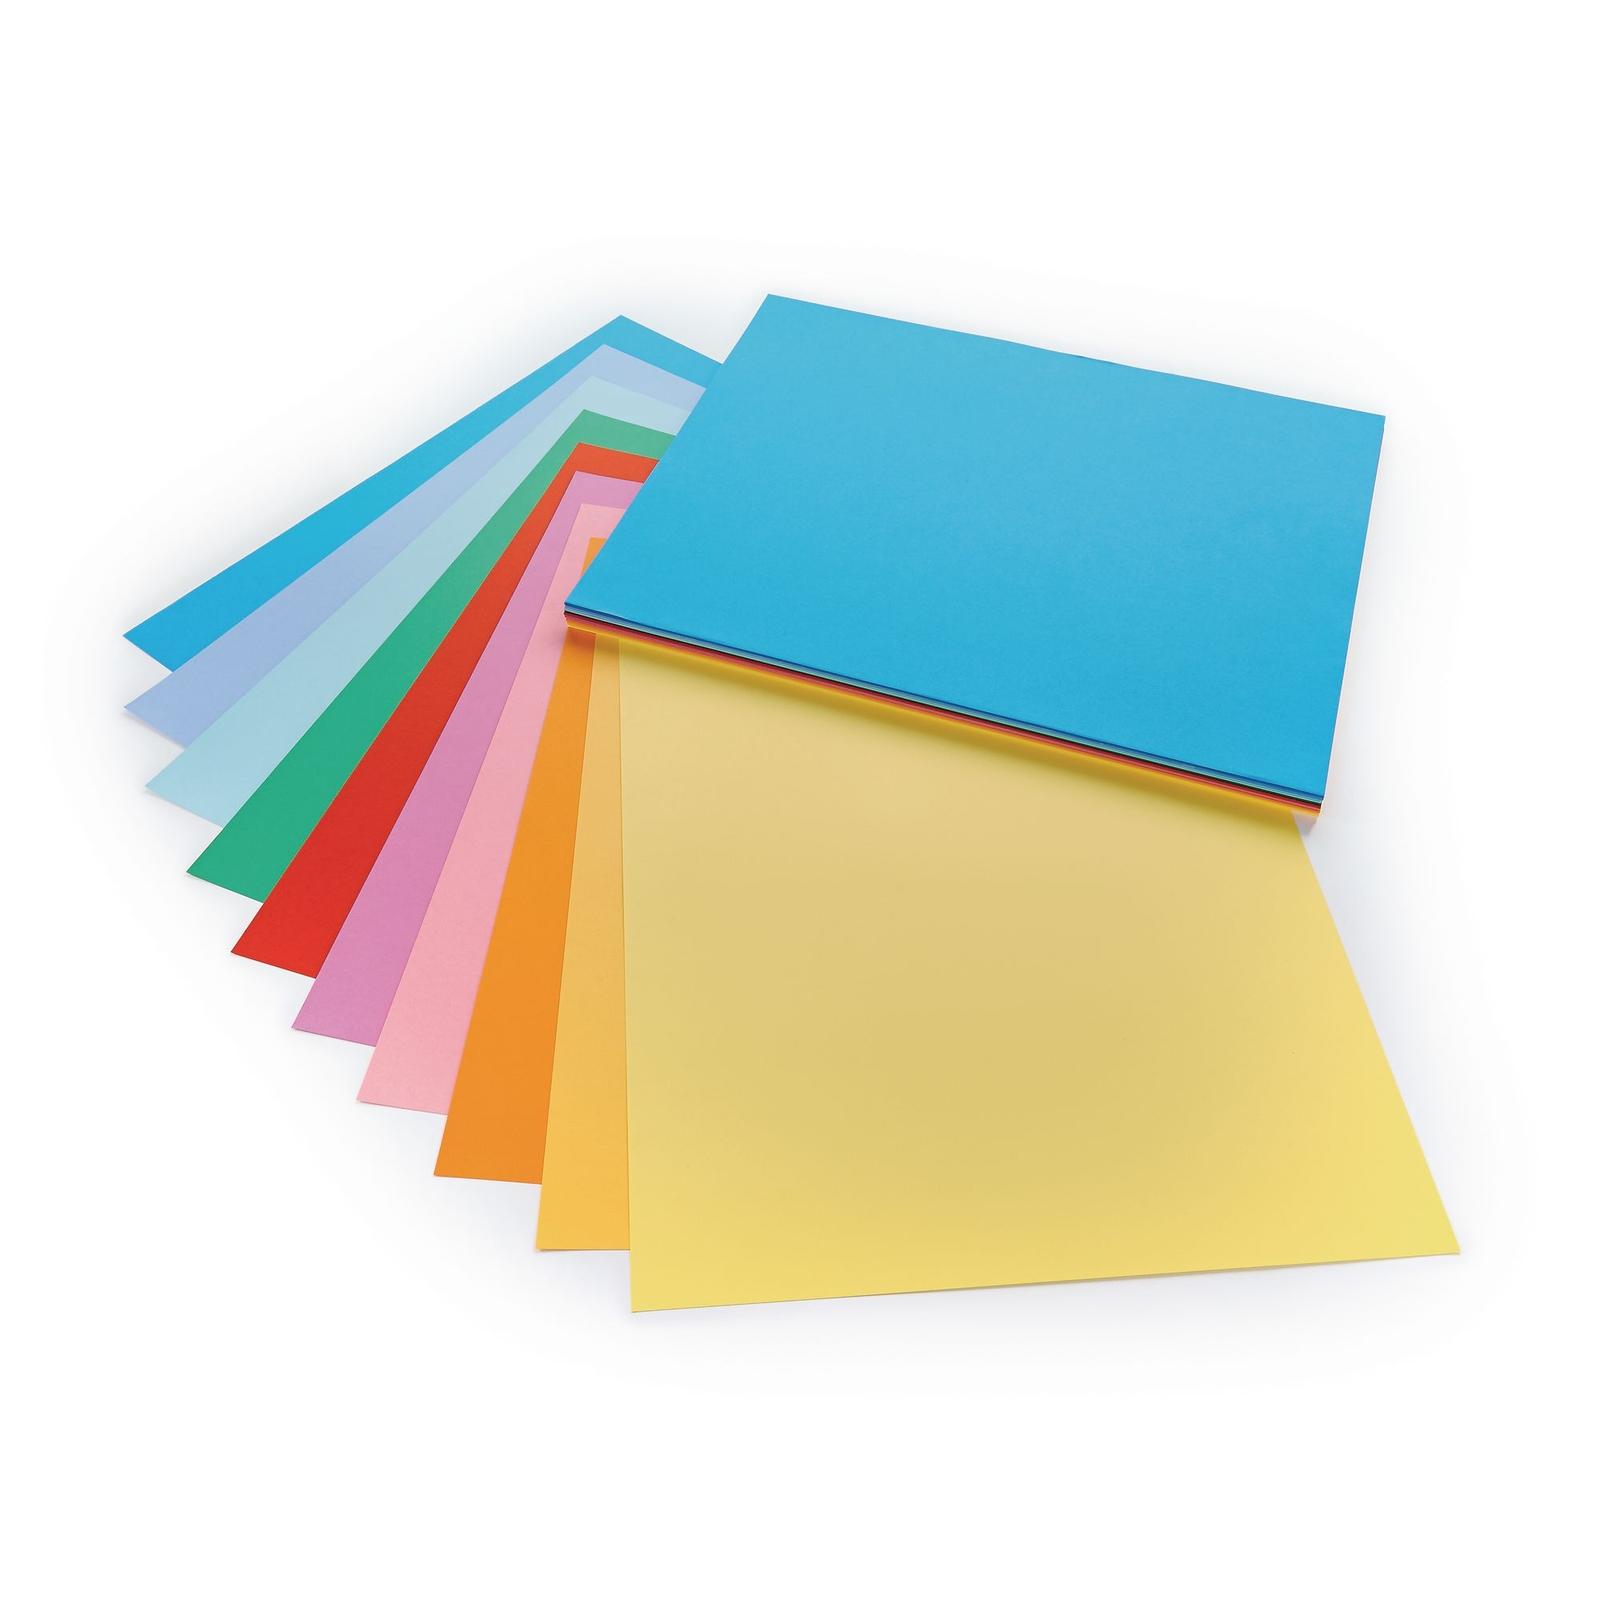 Vanguard 520 x 640mm Coloured Card - Assorted